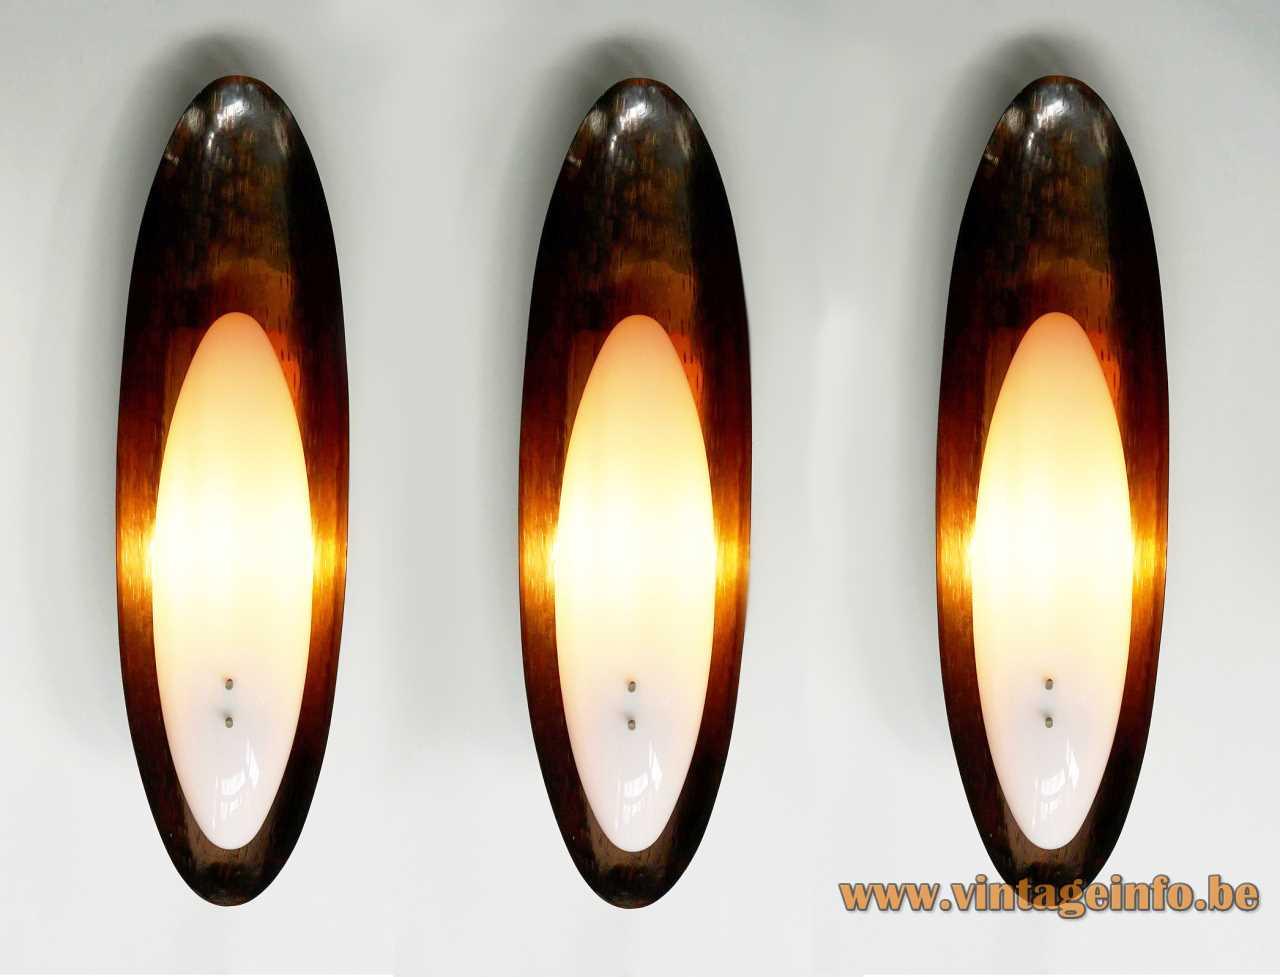 Reggiani oval copper wall lamp hammered base white acrylic lampshade 1960s 1970s Italy E27 sockets